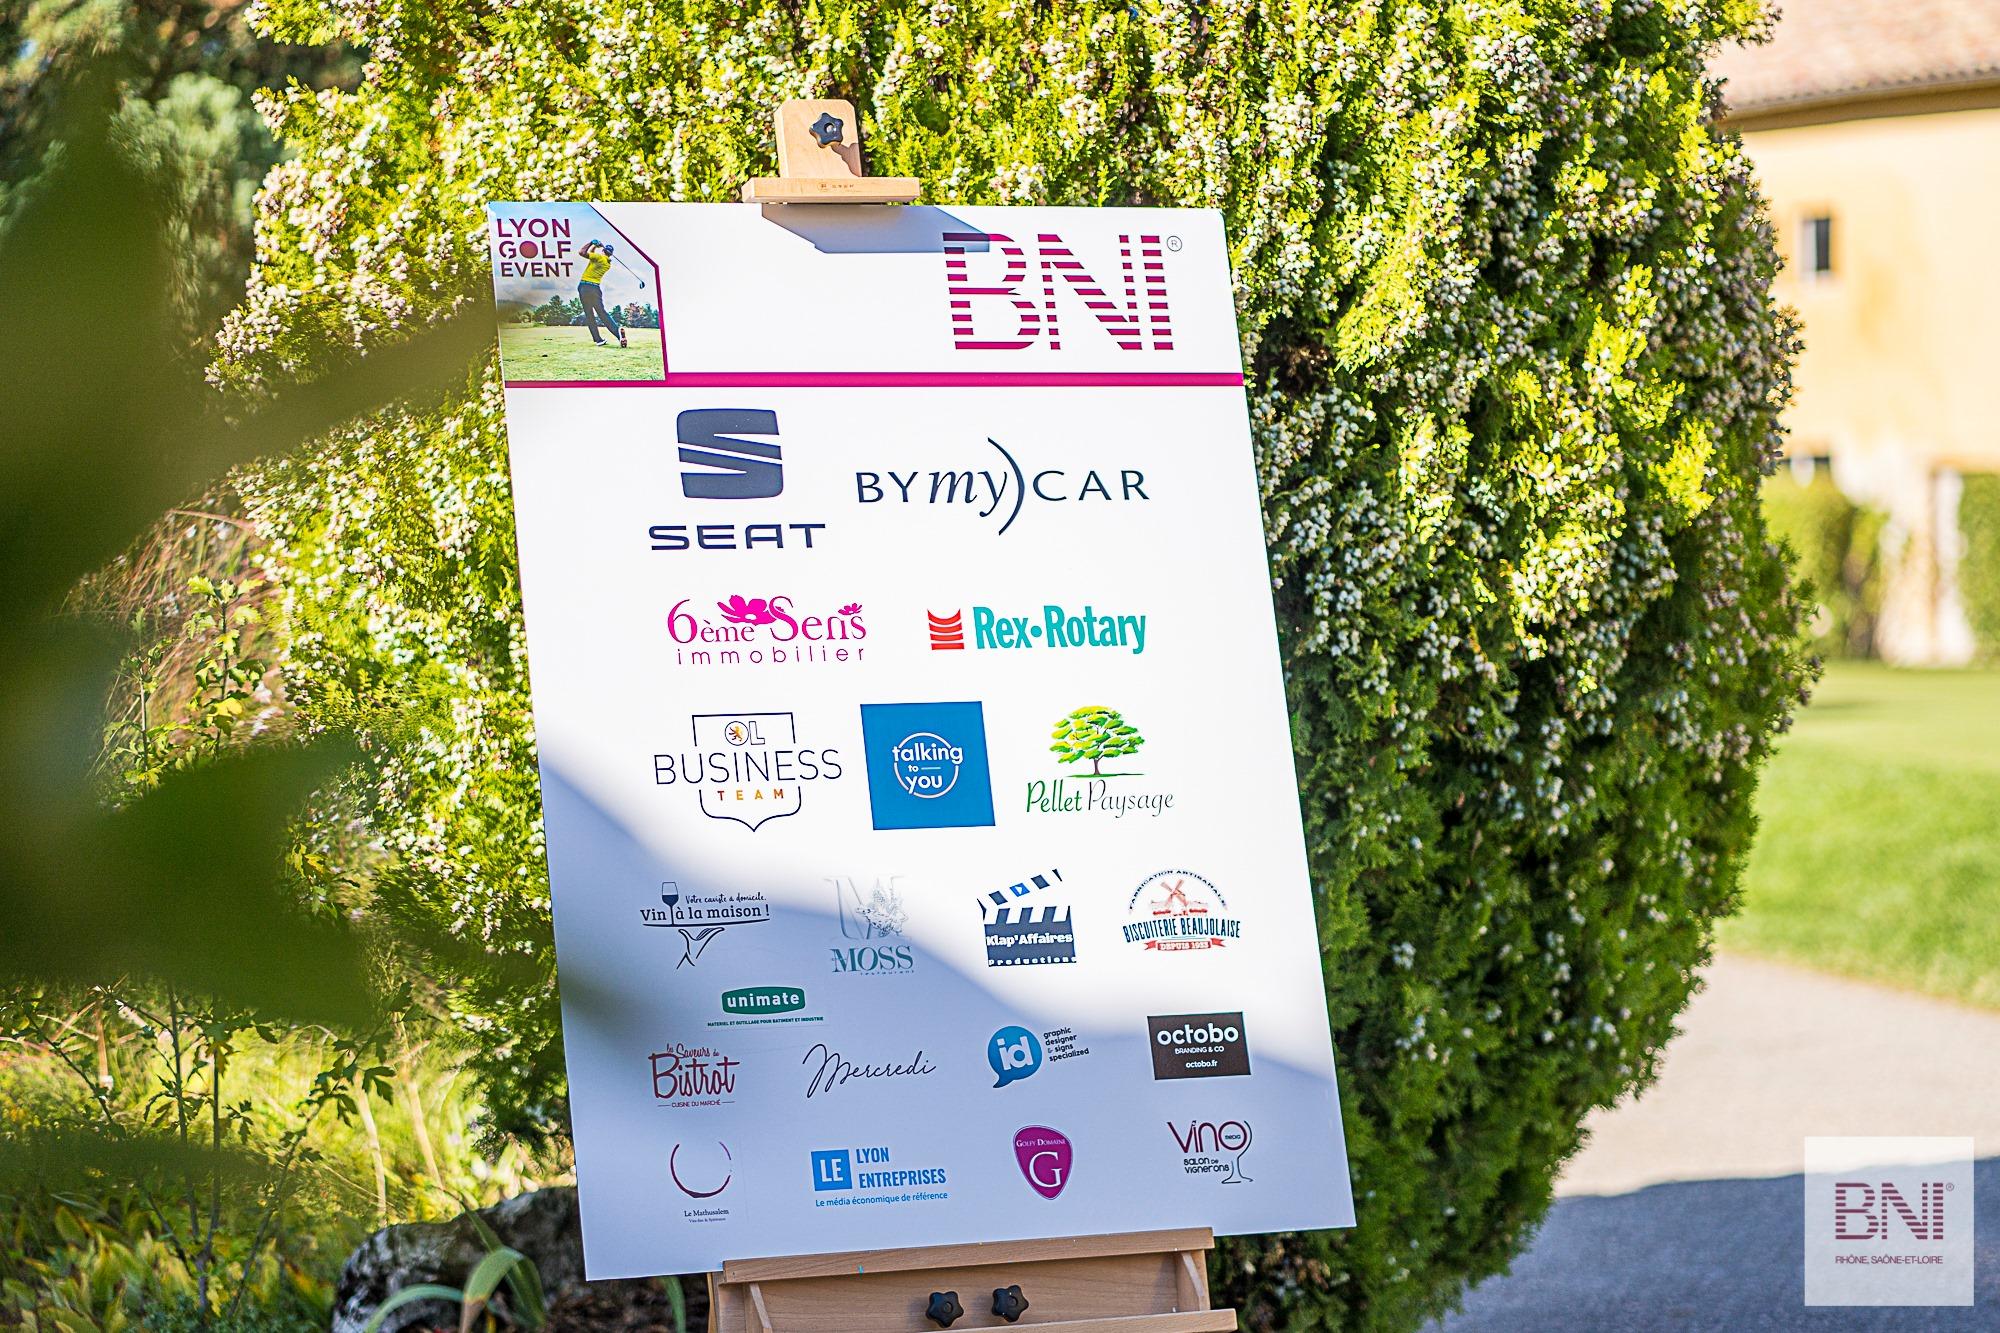 Bni_Lyon_Gofl_event01.jpg